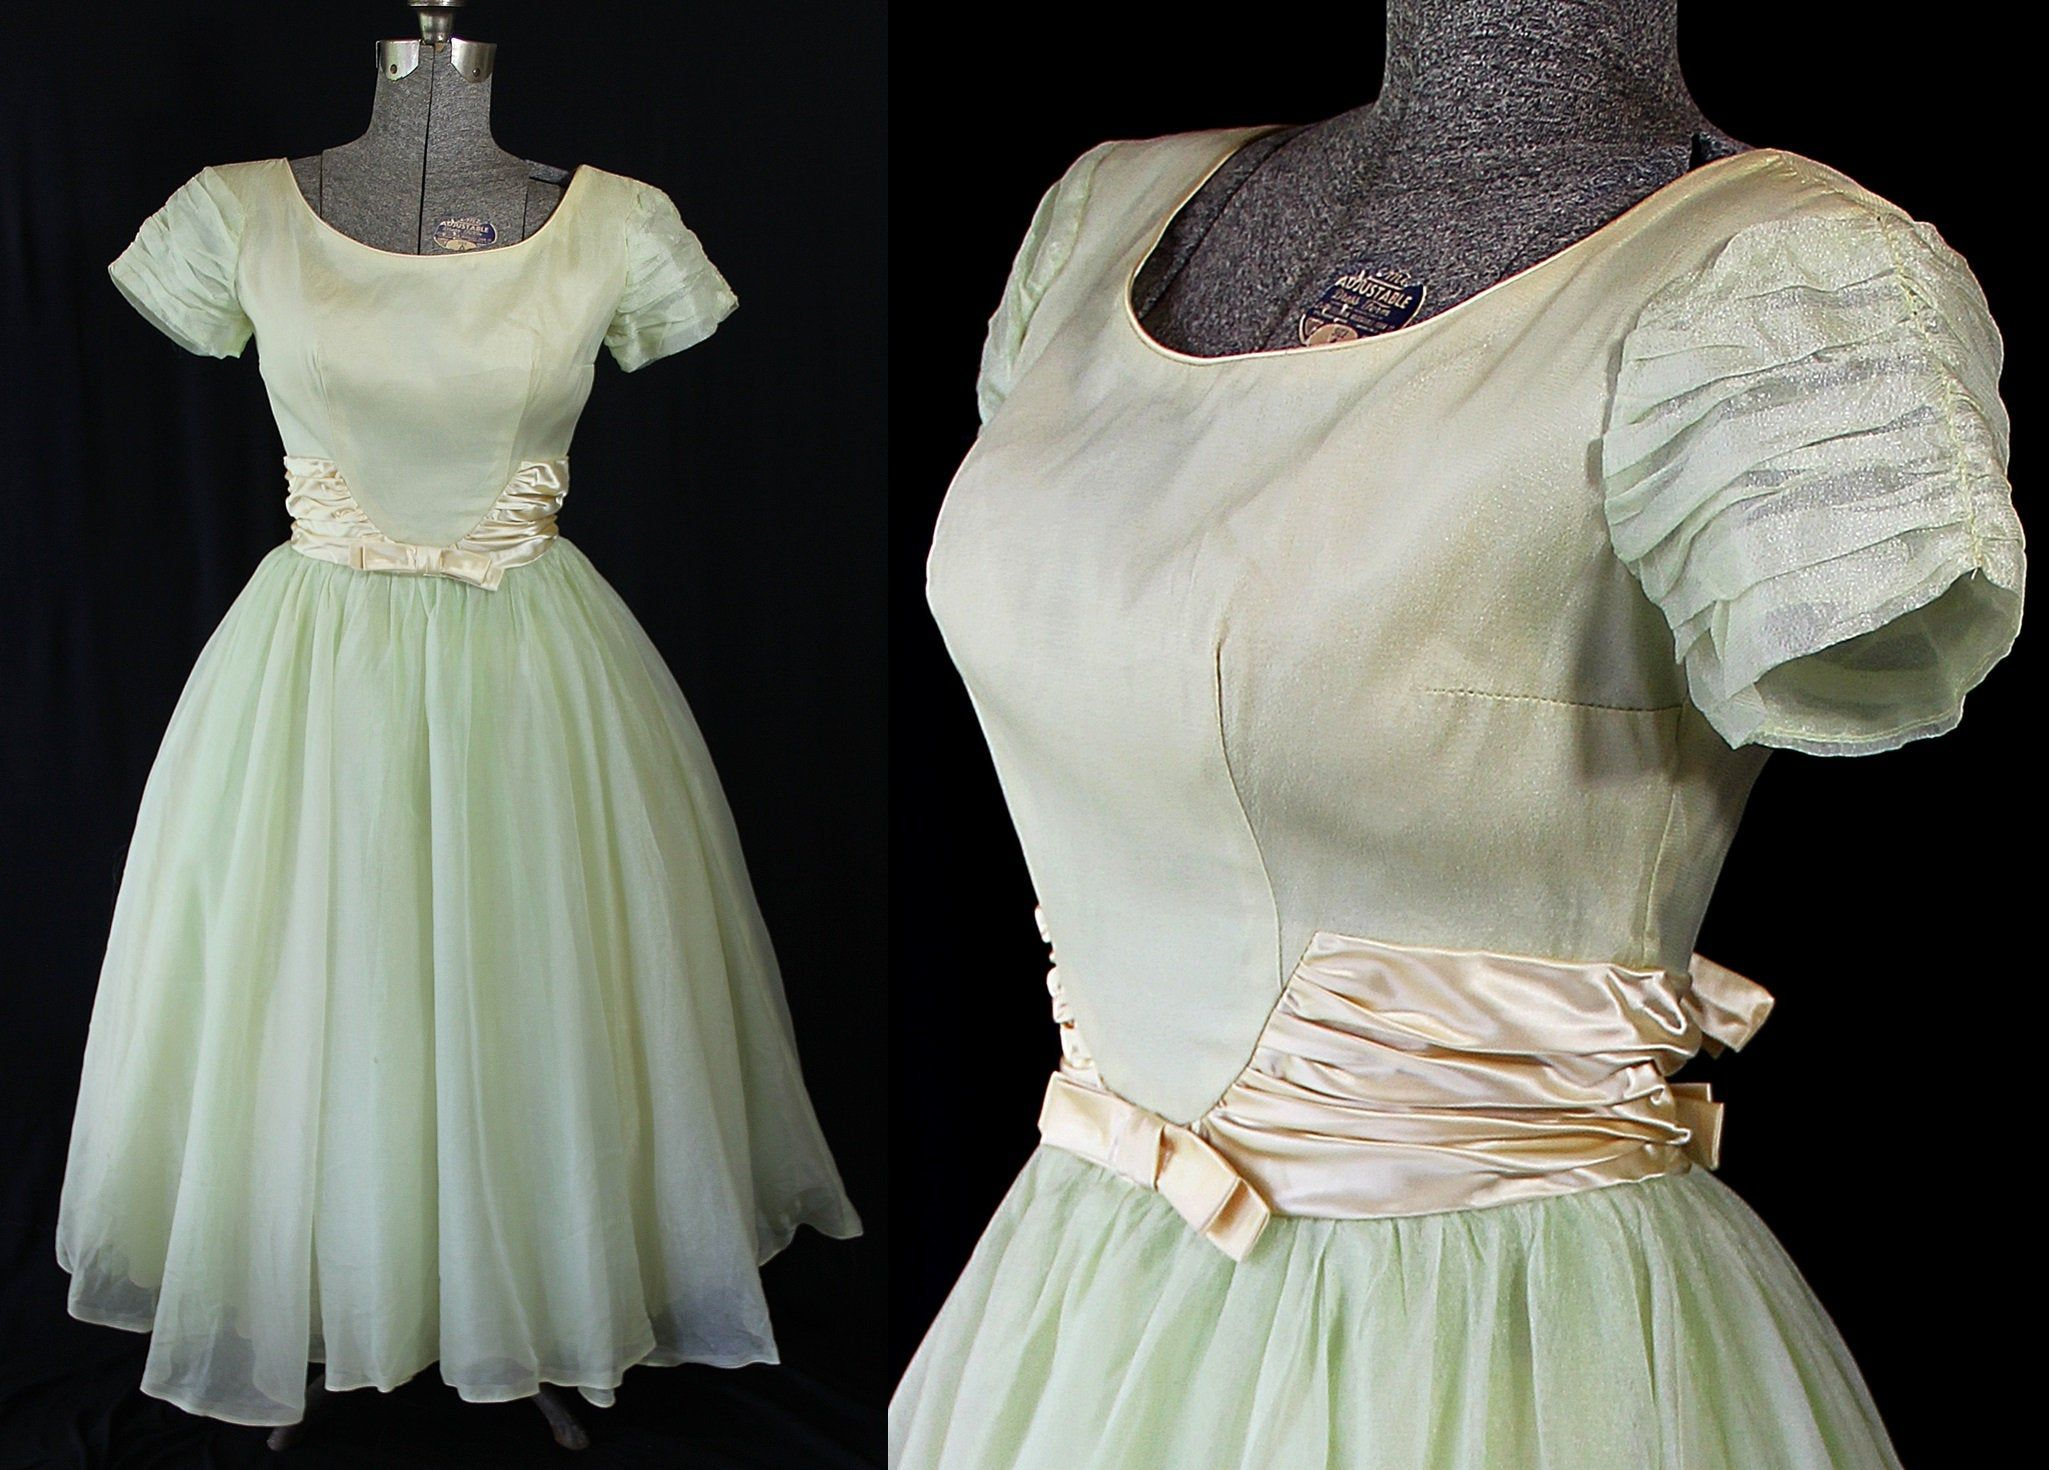 Emma Domb Dress 60s Party Prom Vintage Wedding Pale Green Etsy In 2021 Dresses 60s Dress Tent Dress [ 1470 x 2049 Pixel ]